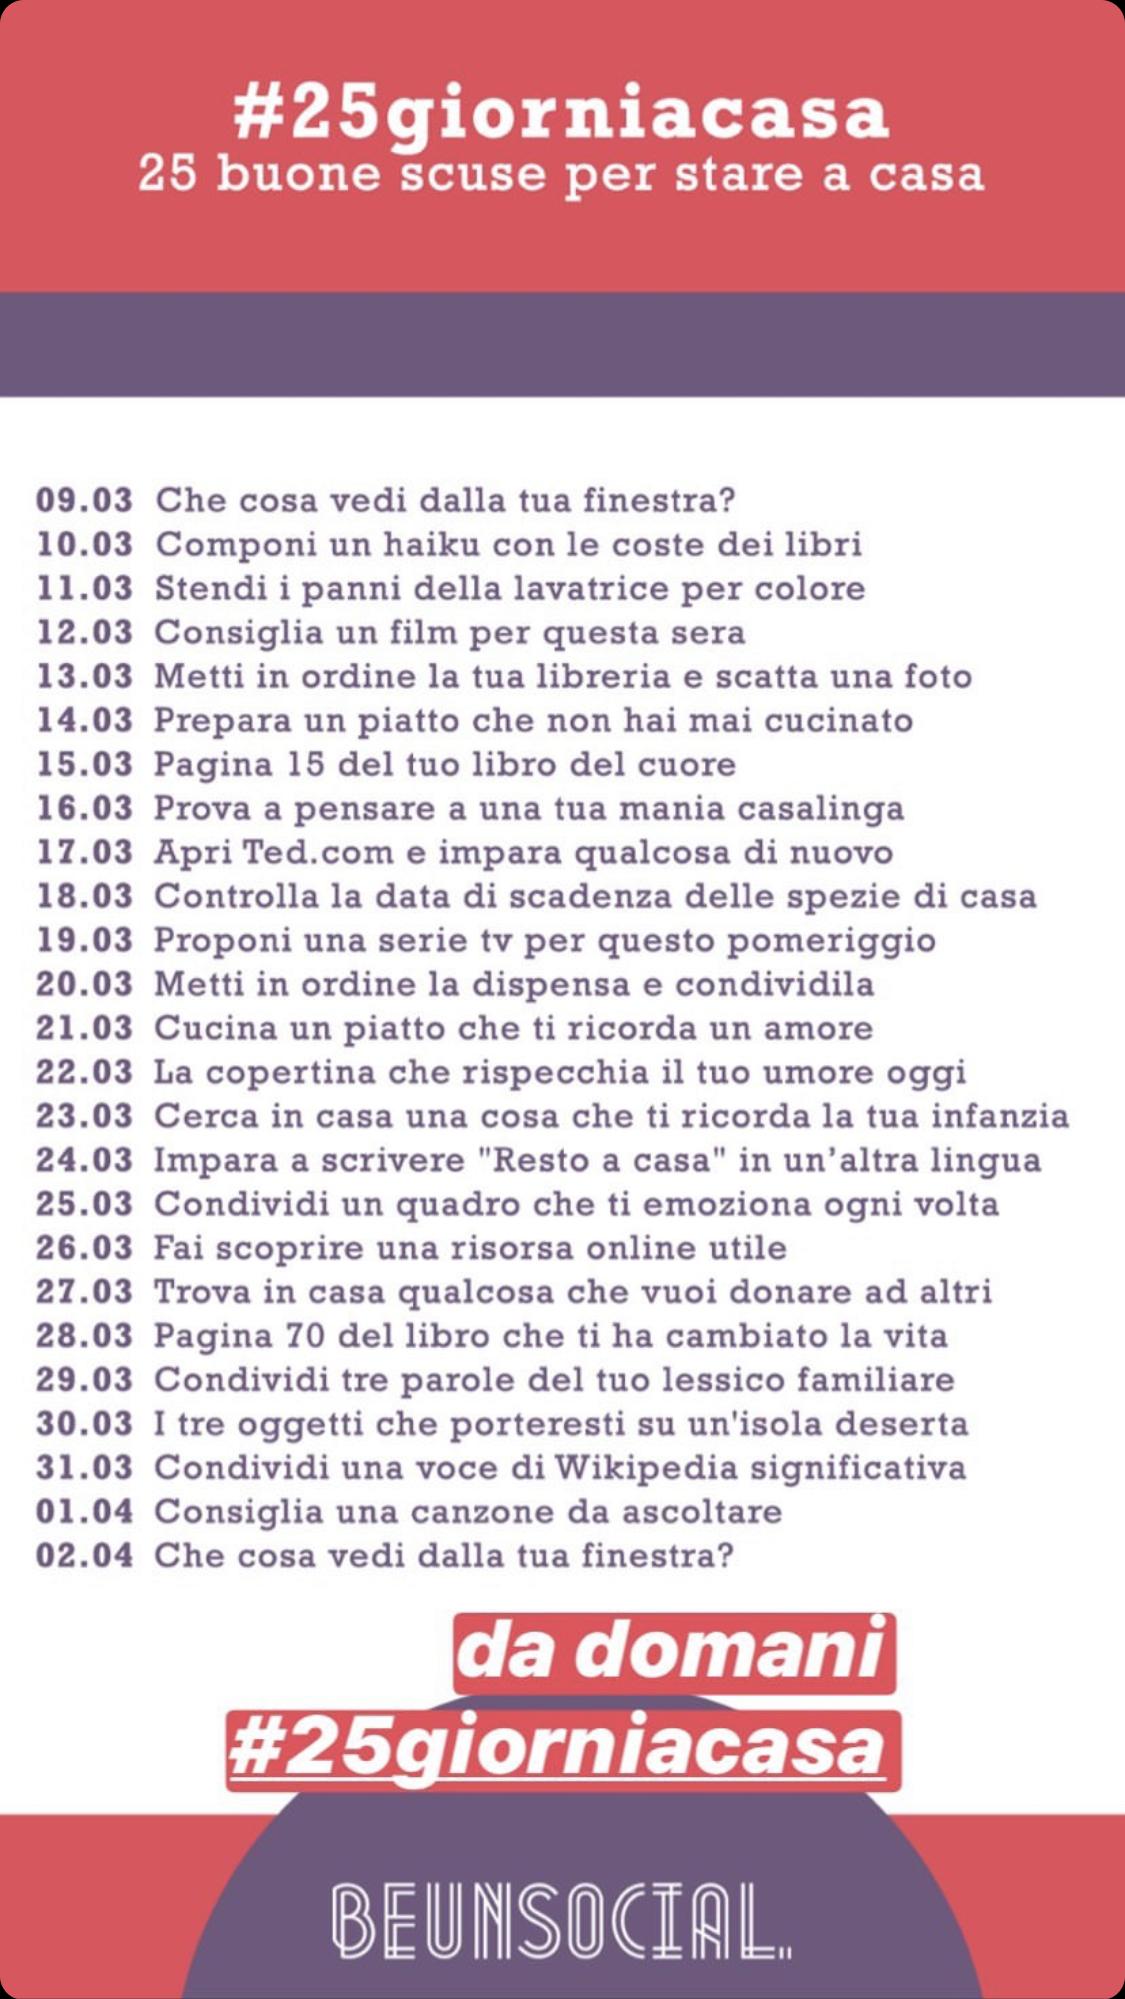 challenge #25giorniacasa alice avallone